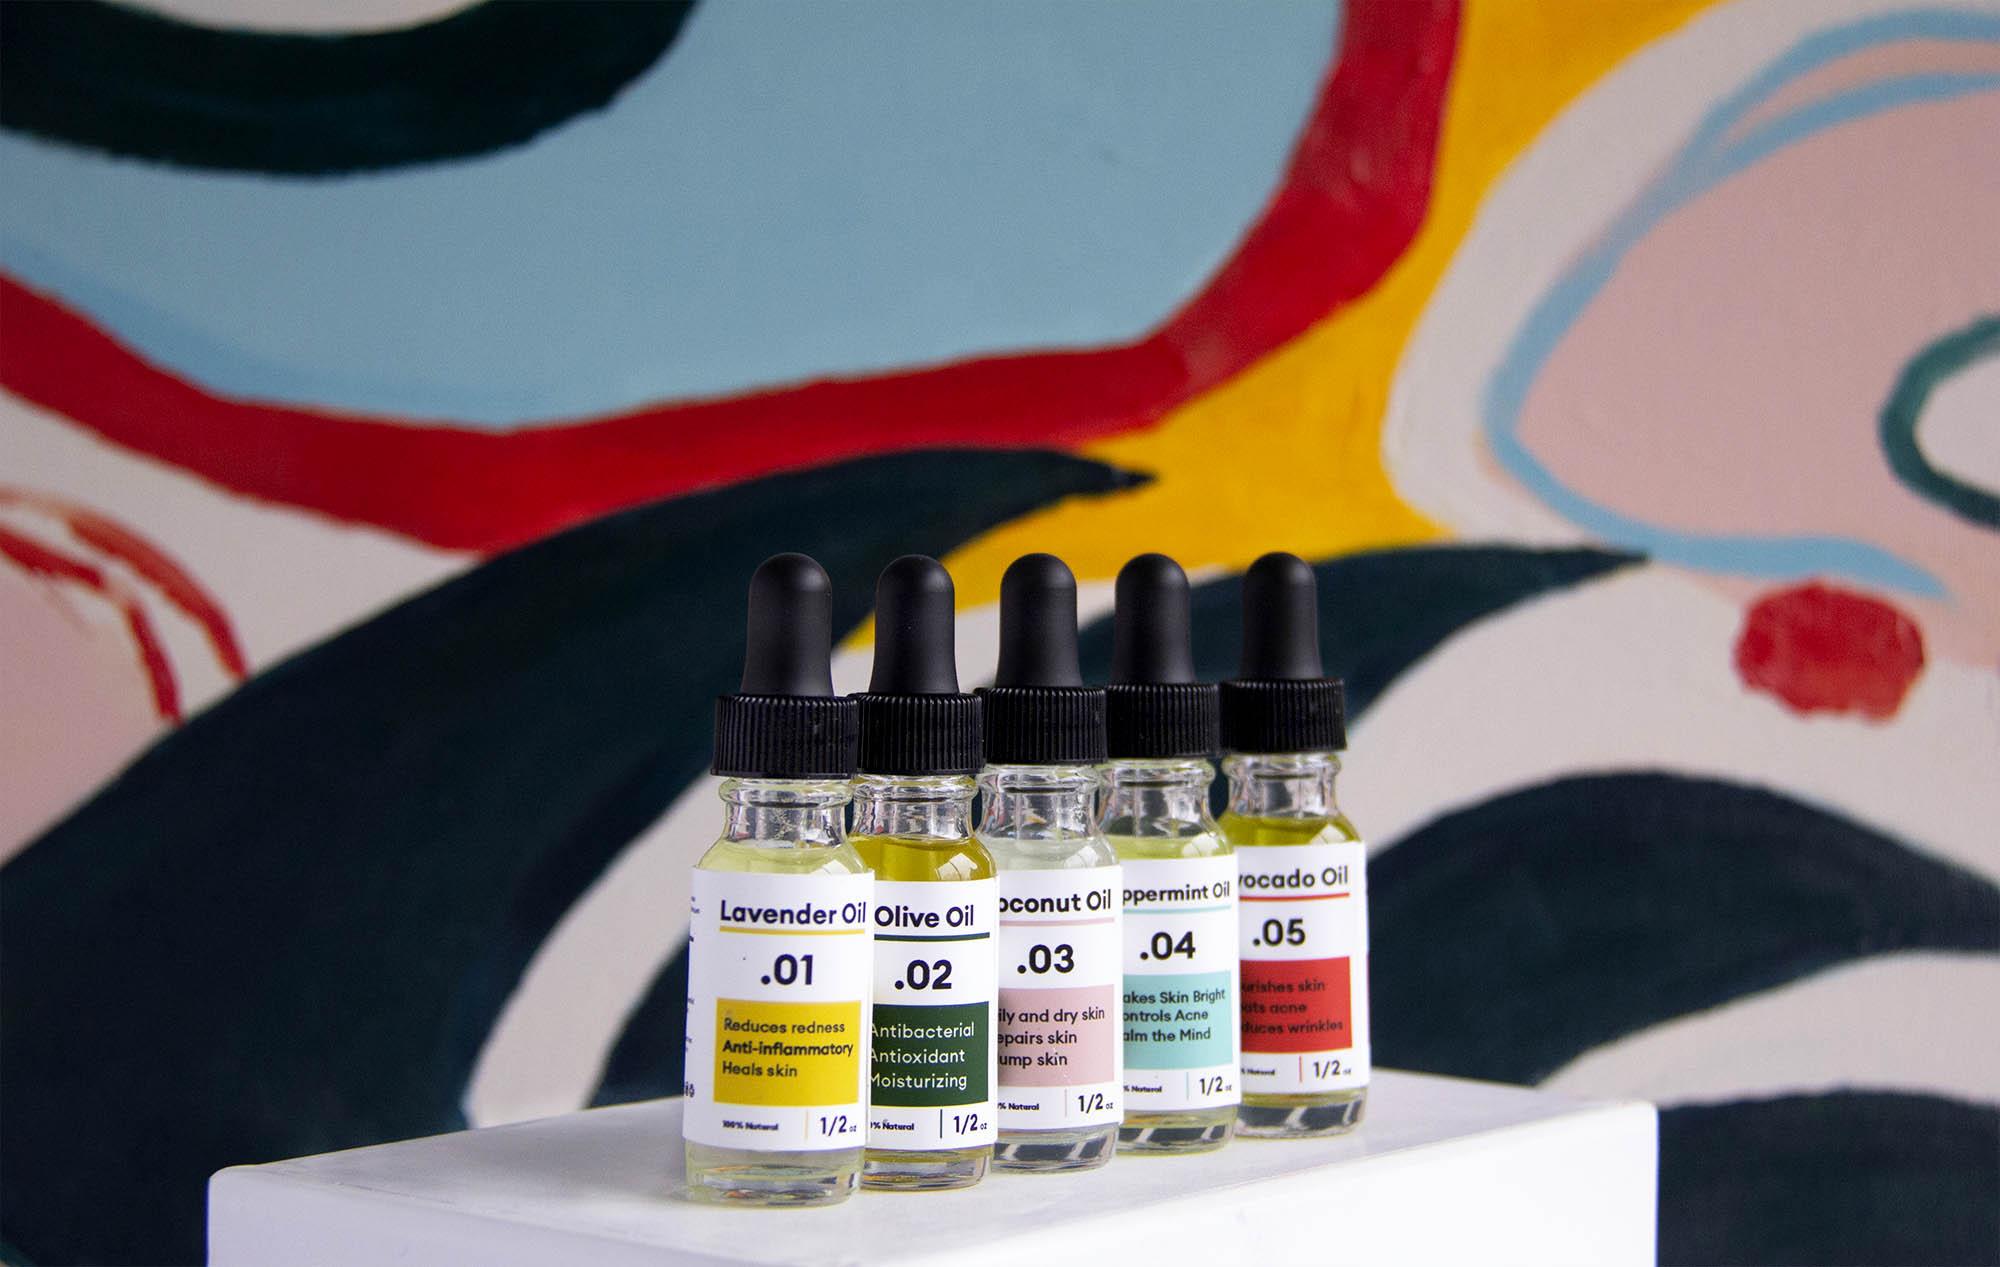 kenko bottle line up